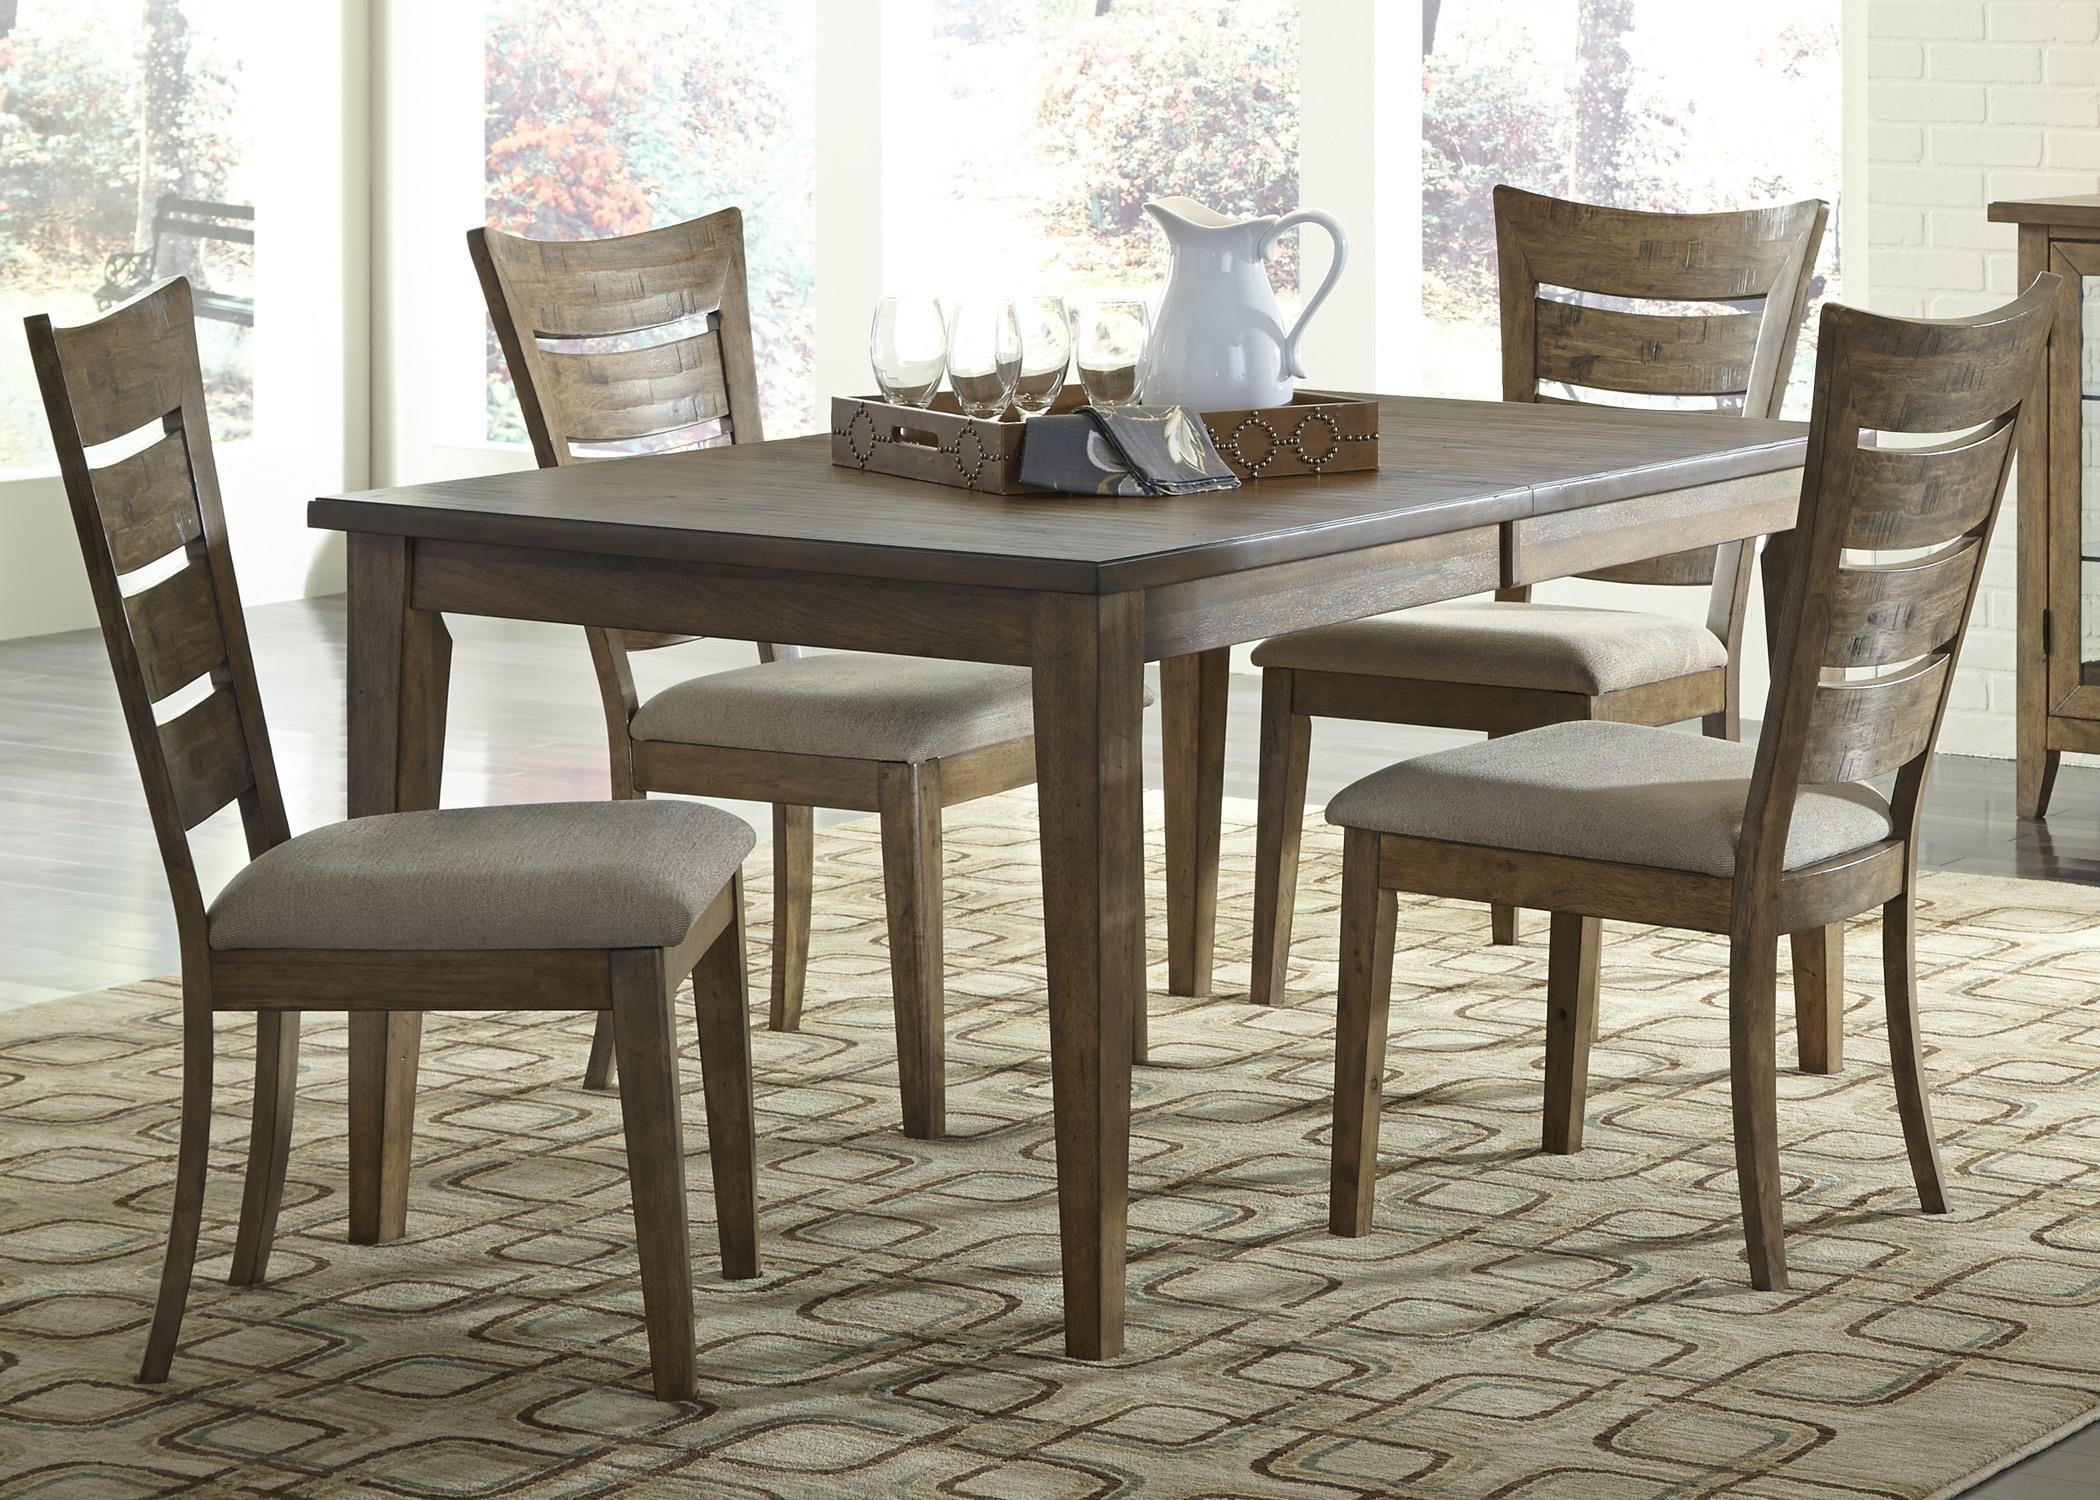 36+ Pilgrim furniture dining room sets Best Choice